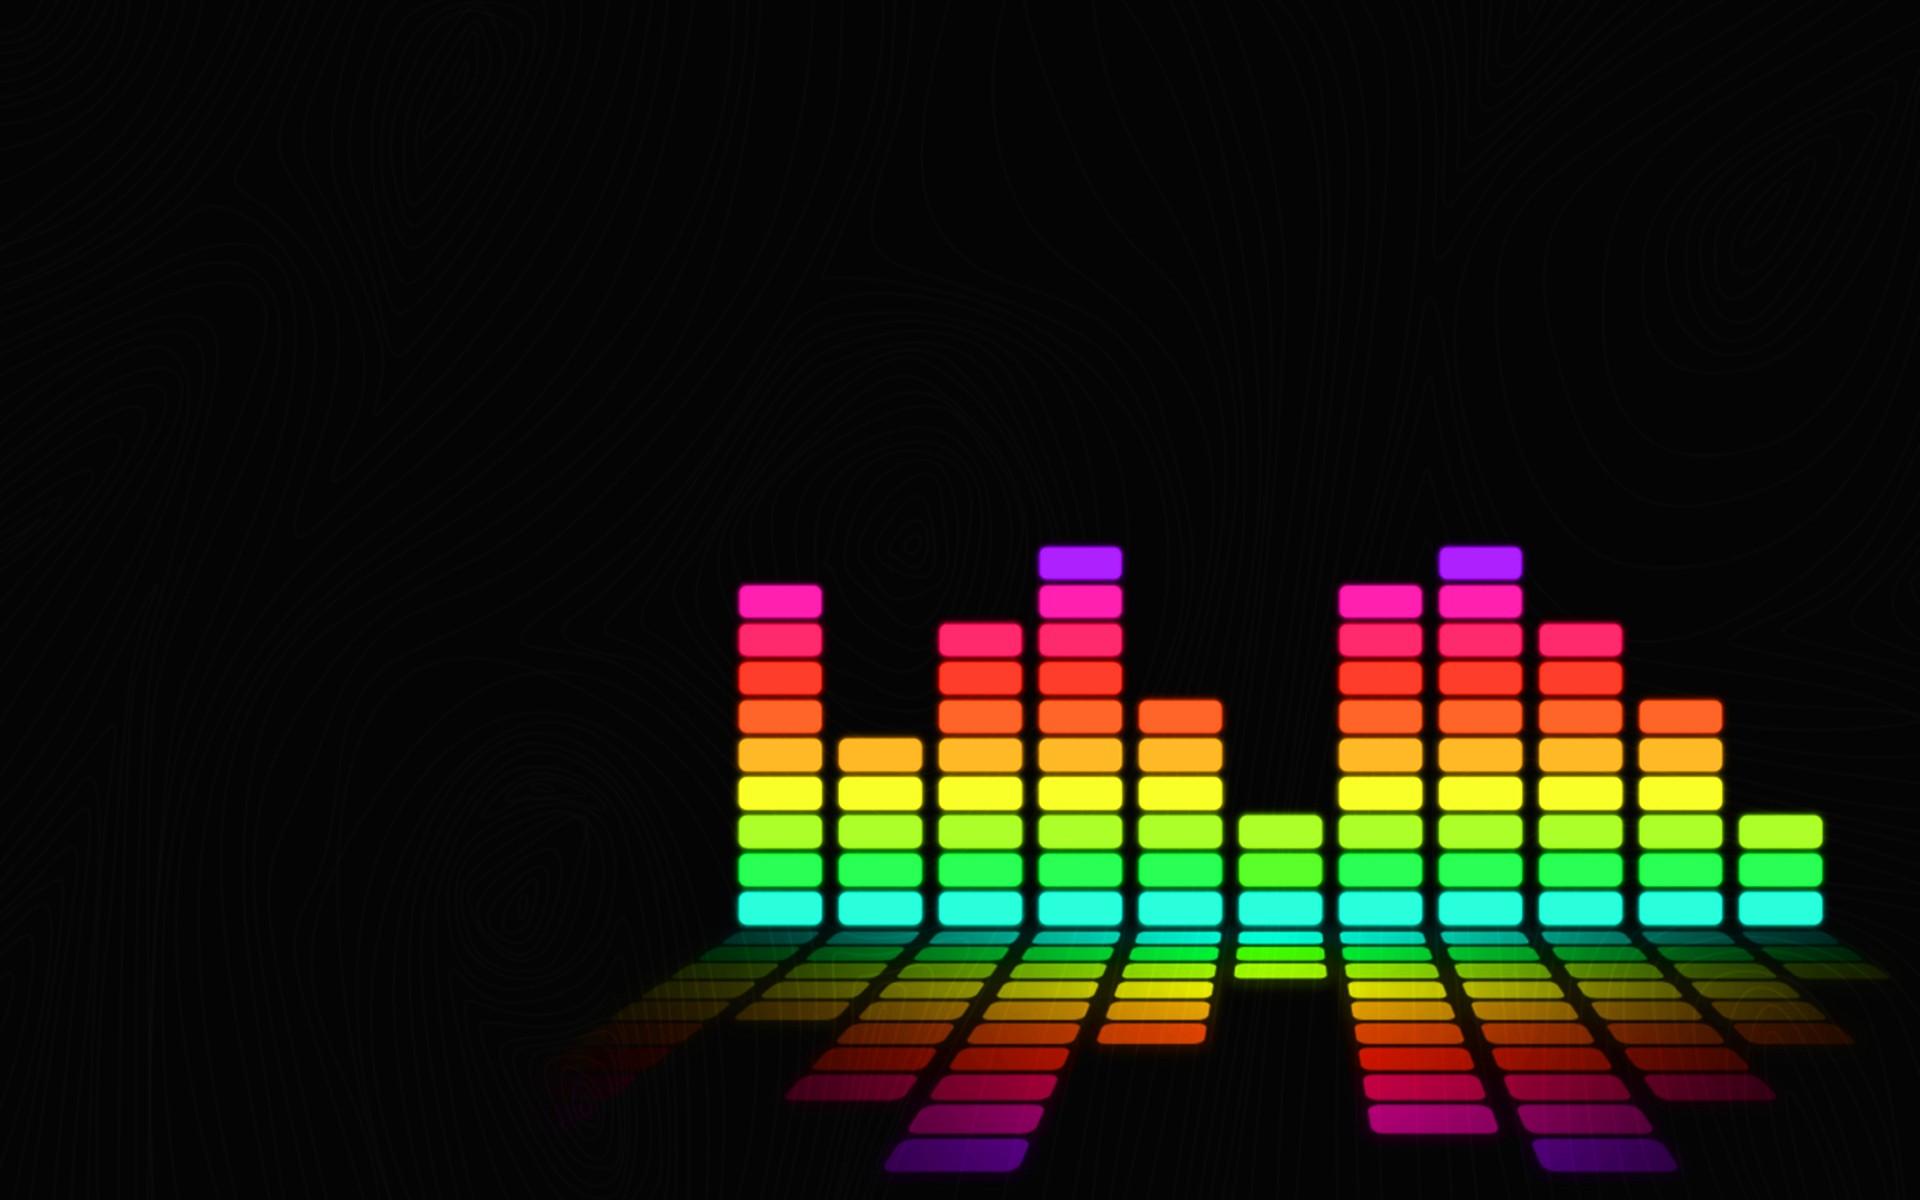 Fondos De Pantalla Noche Rojo Música Señal De Neón Dj